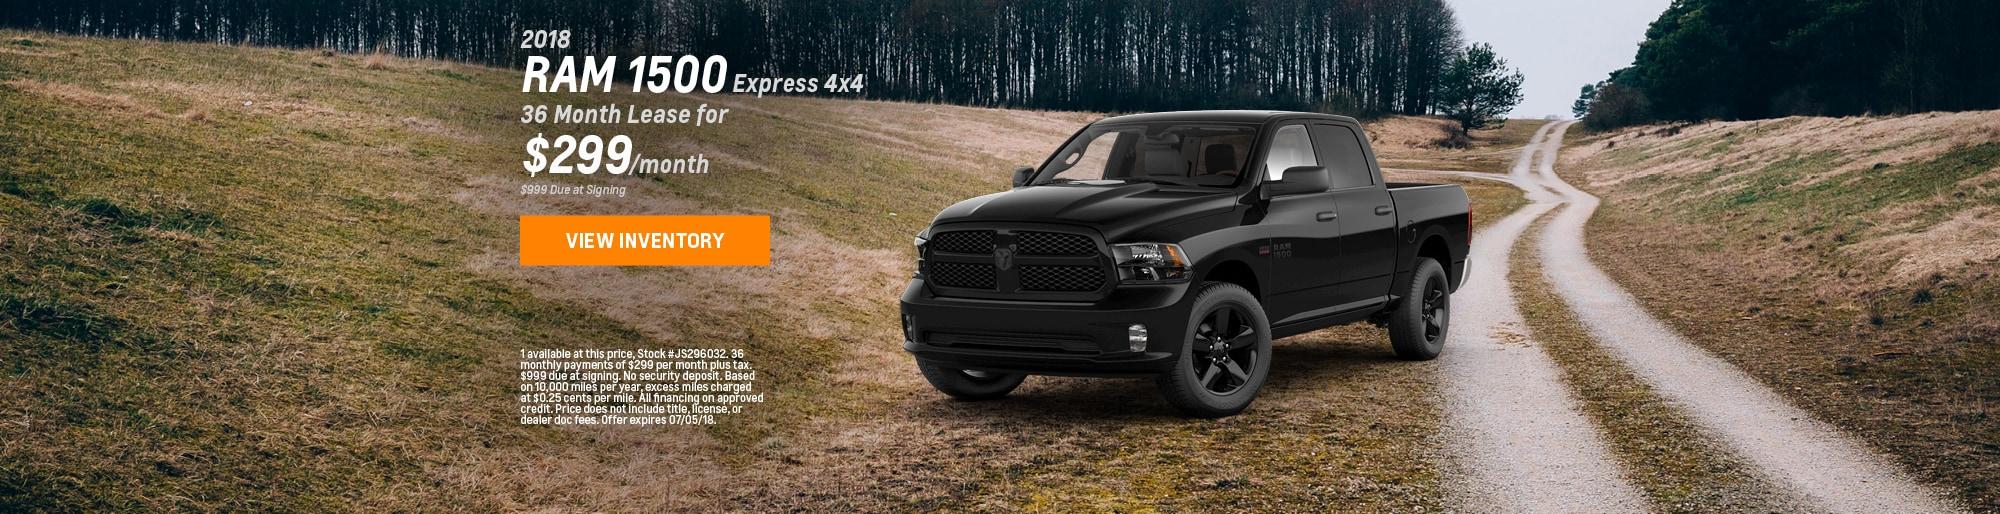 Lithia Dodge Missoula >> New & Used Car Dealership in Missoula | Lithia Chrysler Jeep Dodge of Missoula